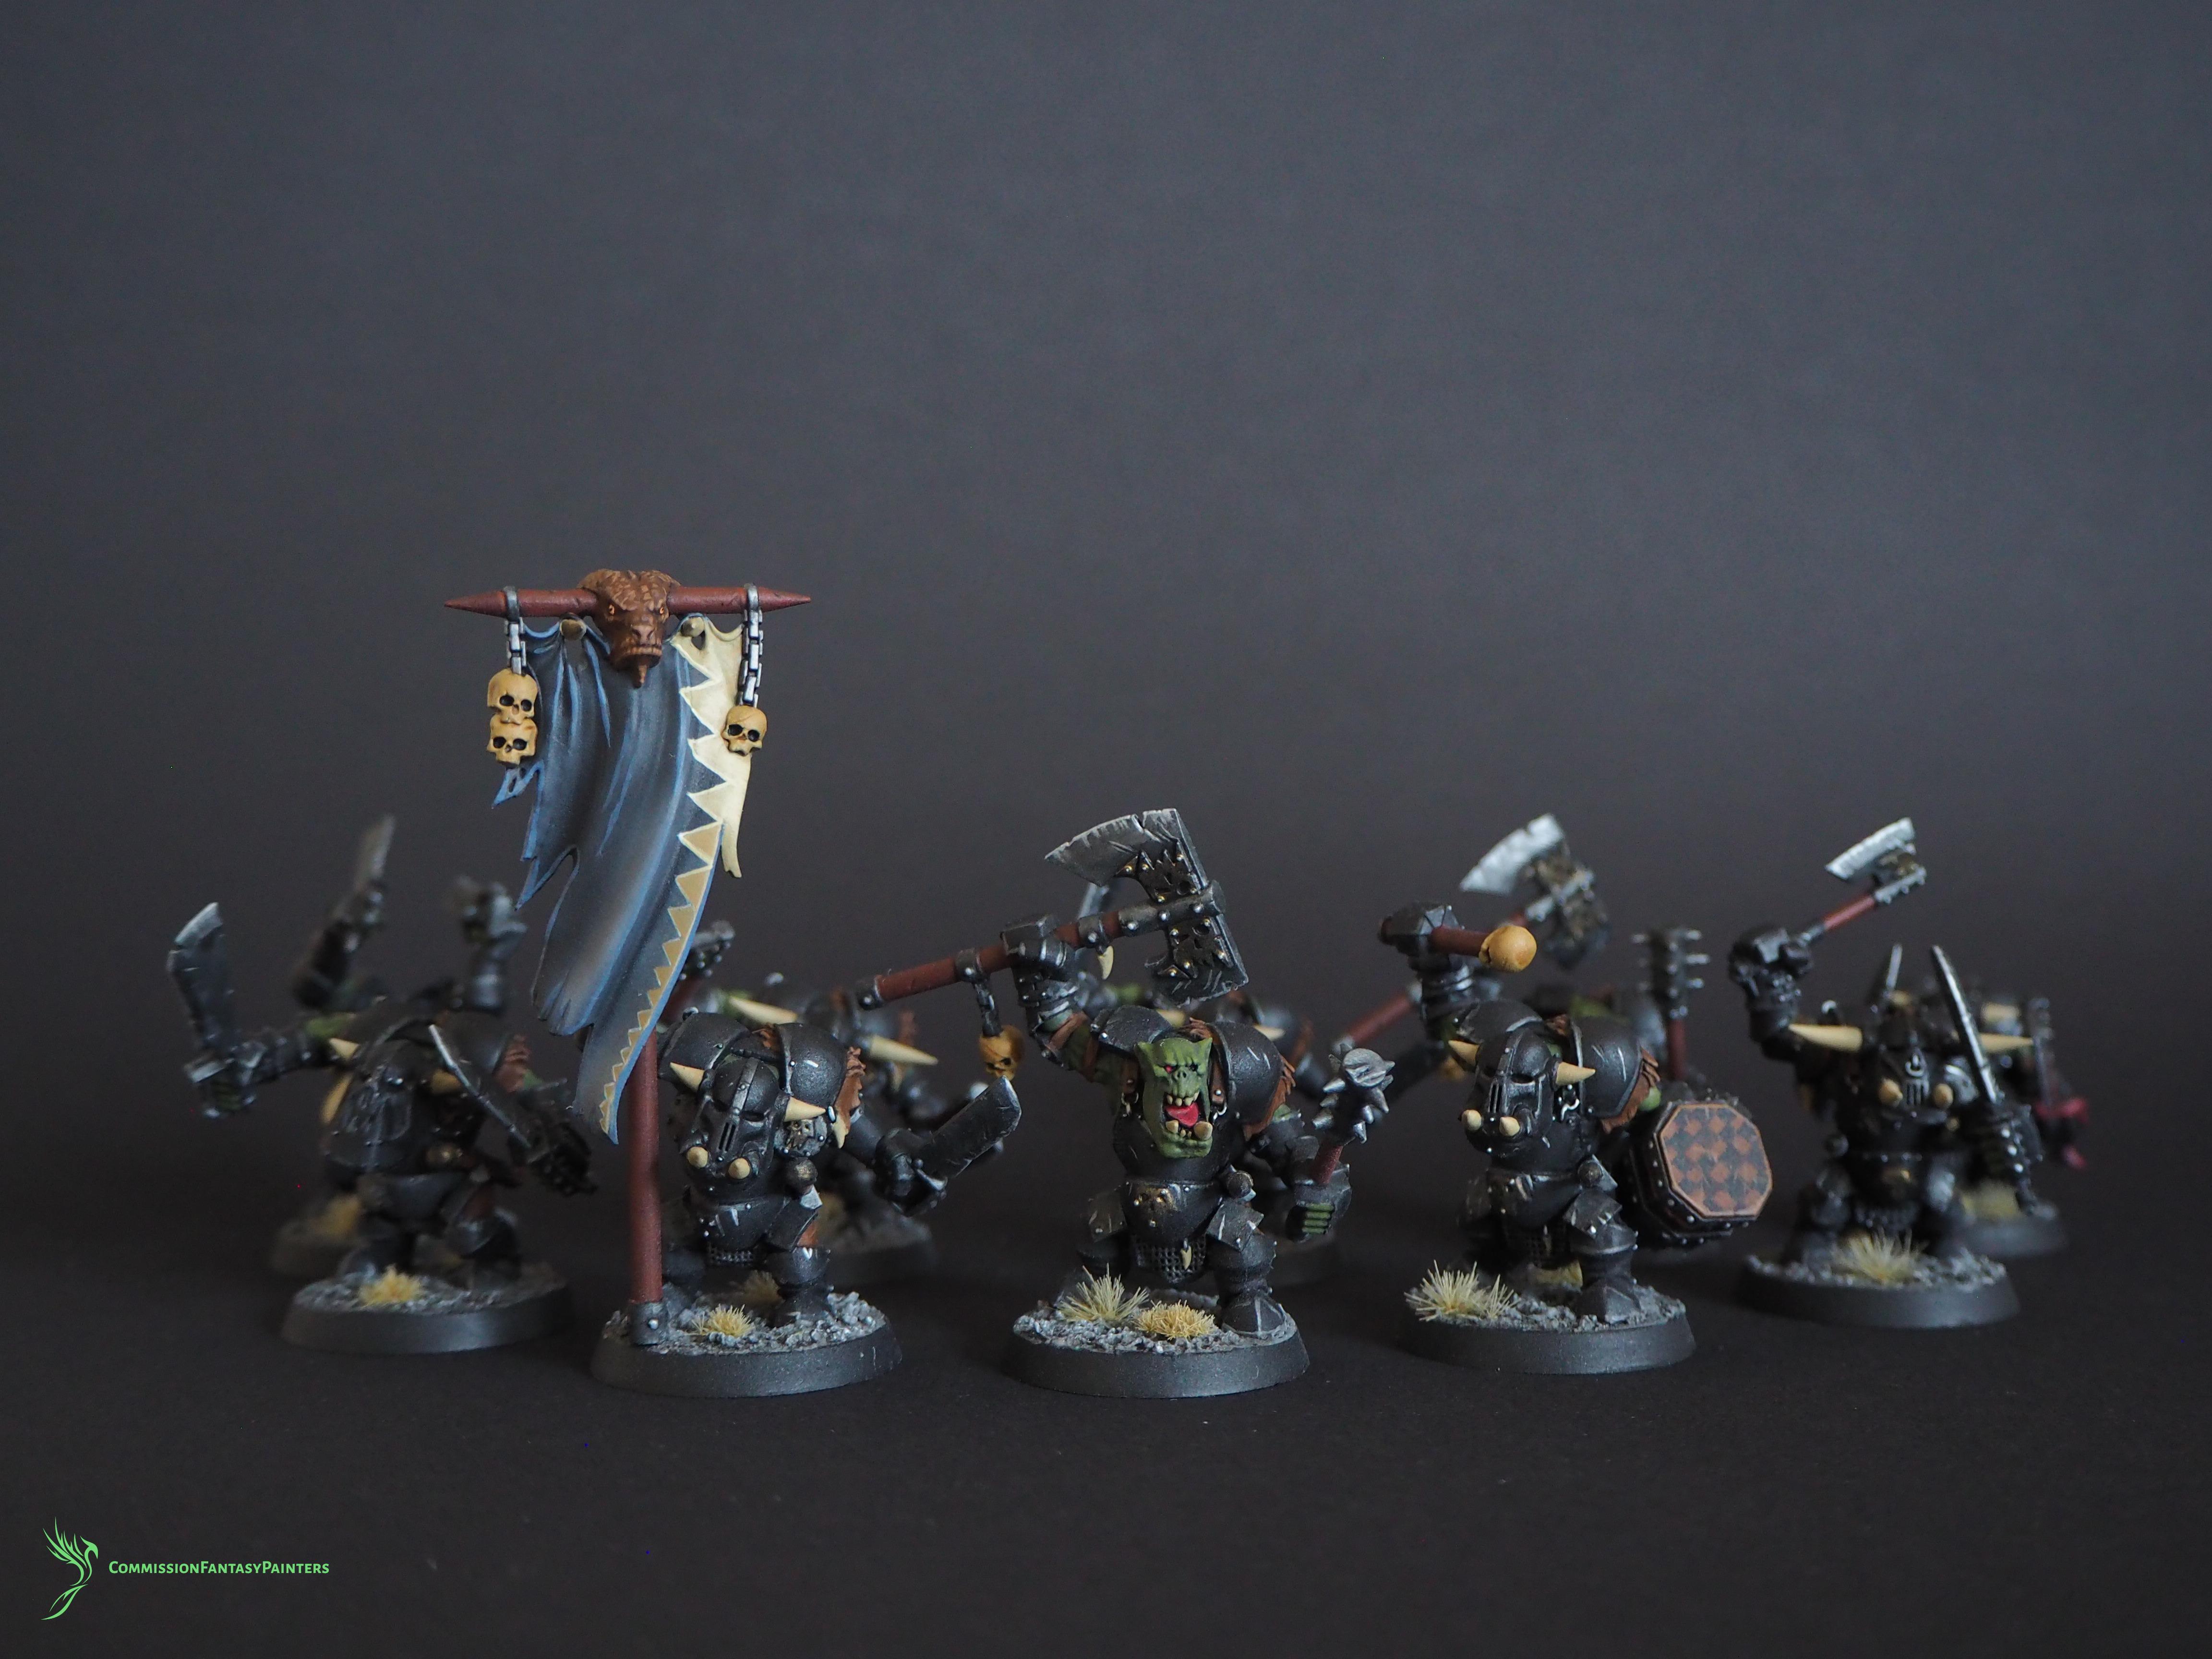 Commissiofantasypainters, Destruction, Ironjawz, Orcs And Goblins, Warhammer Age Of Sigmar, Warhammer Fantasy